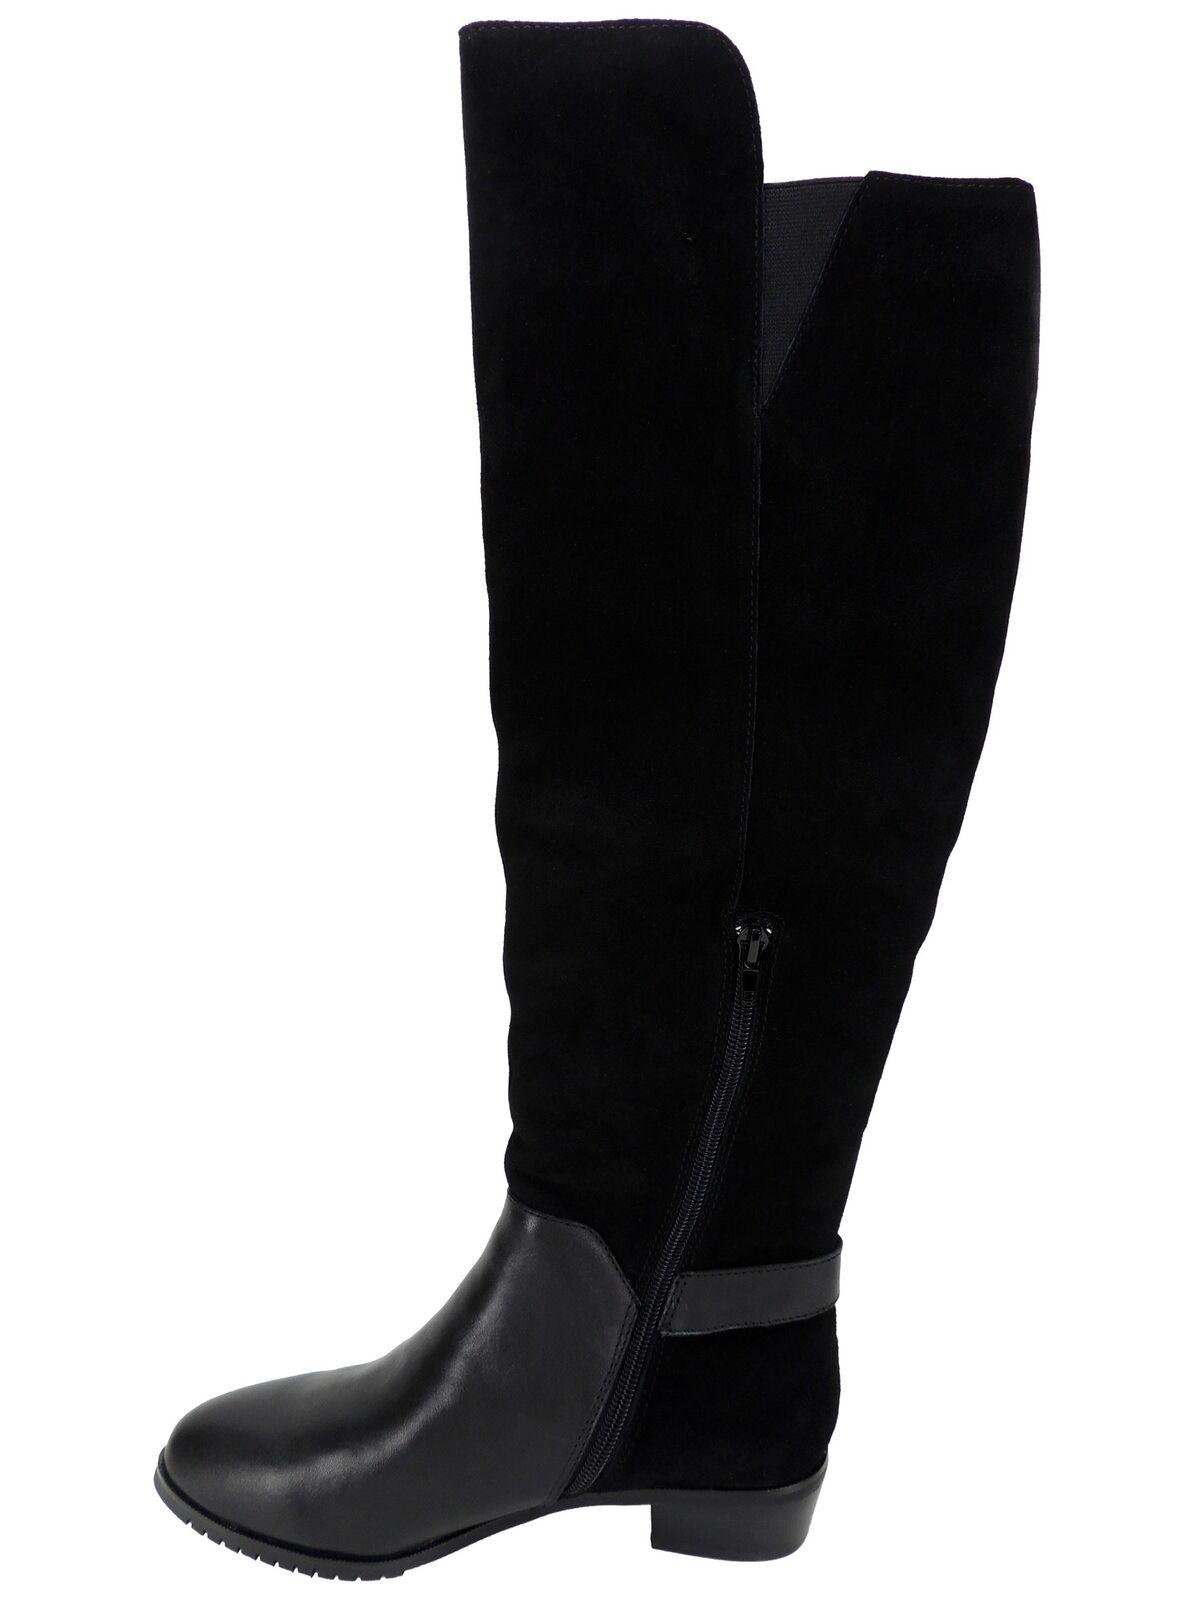 Kelsi Dagger Mujer Brooklyn Vlad sobre la rodilla botas botas rodilla Gamuza tamaño de becerro 6.5 M f1bc54